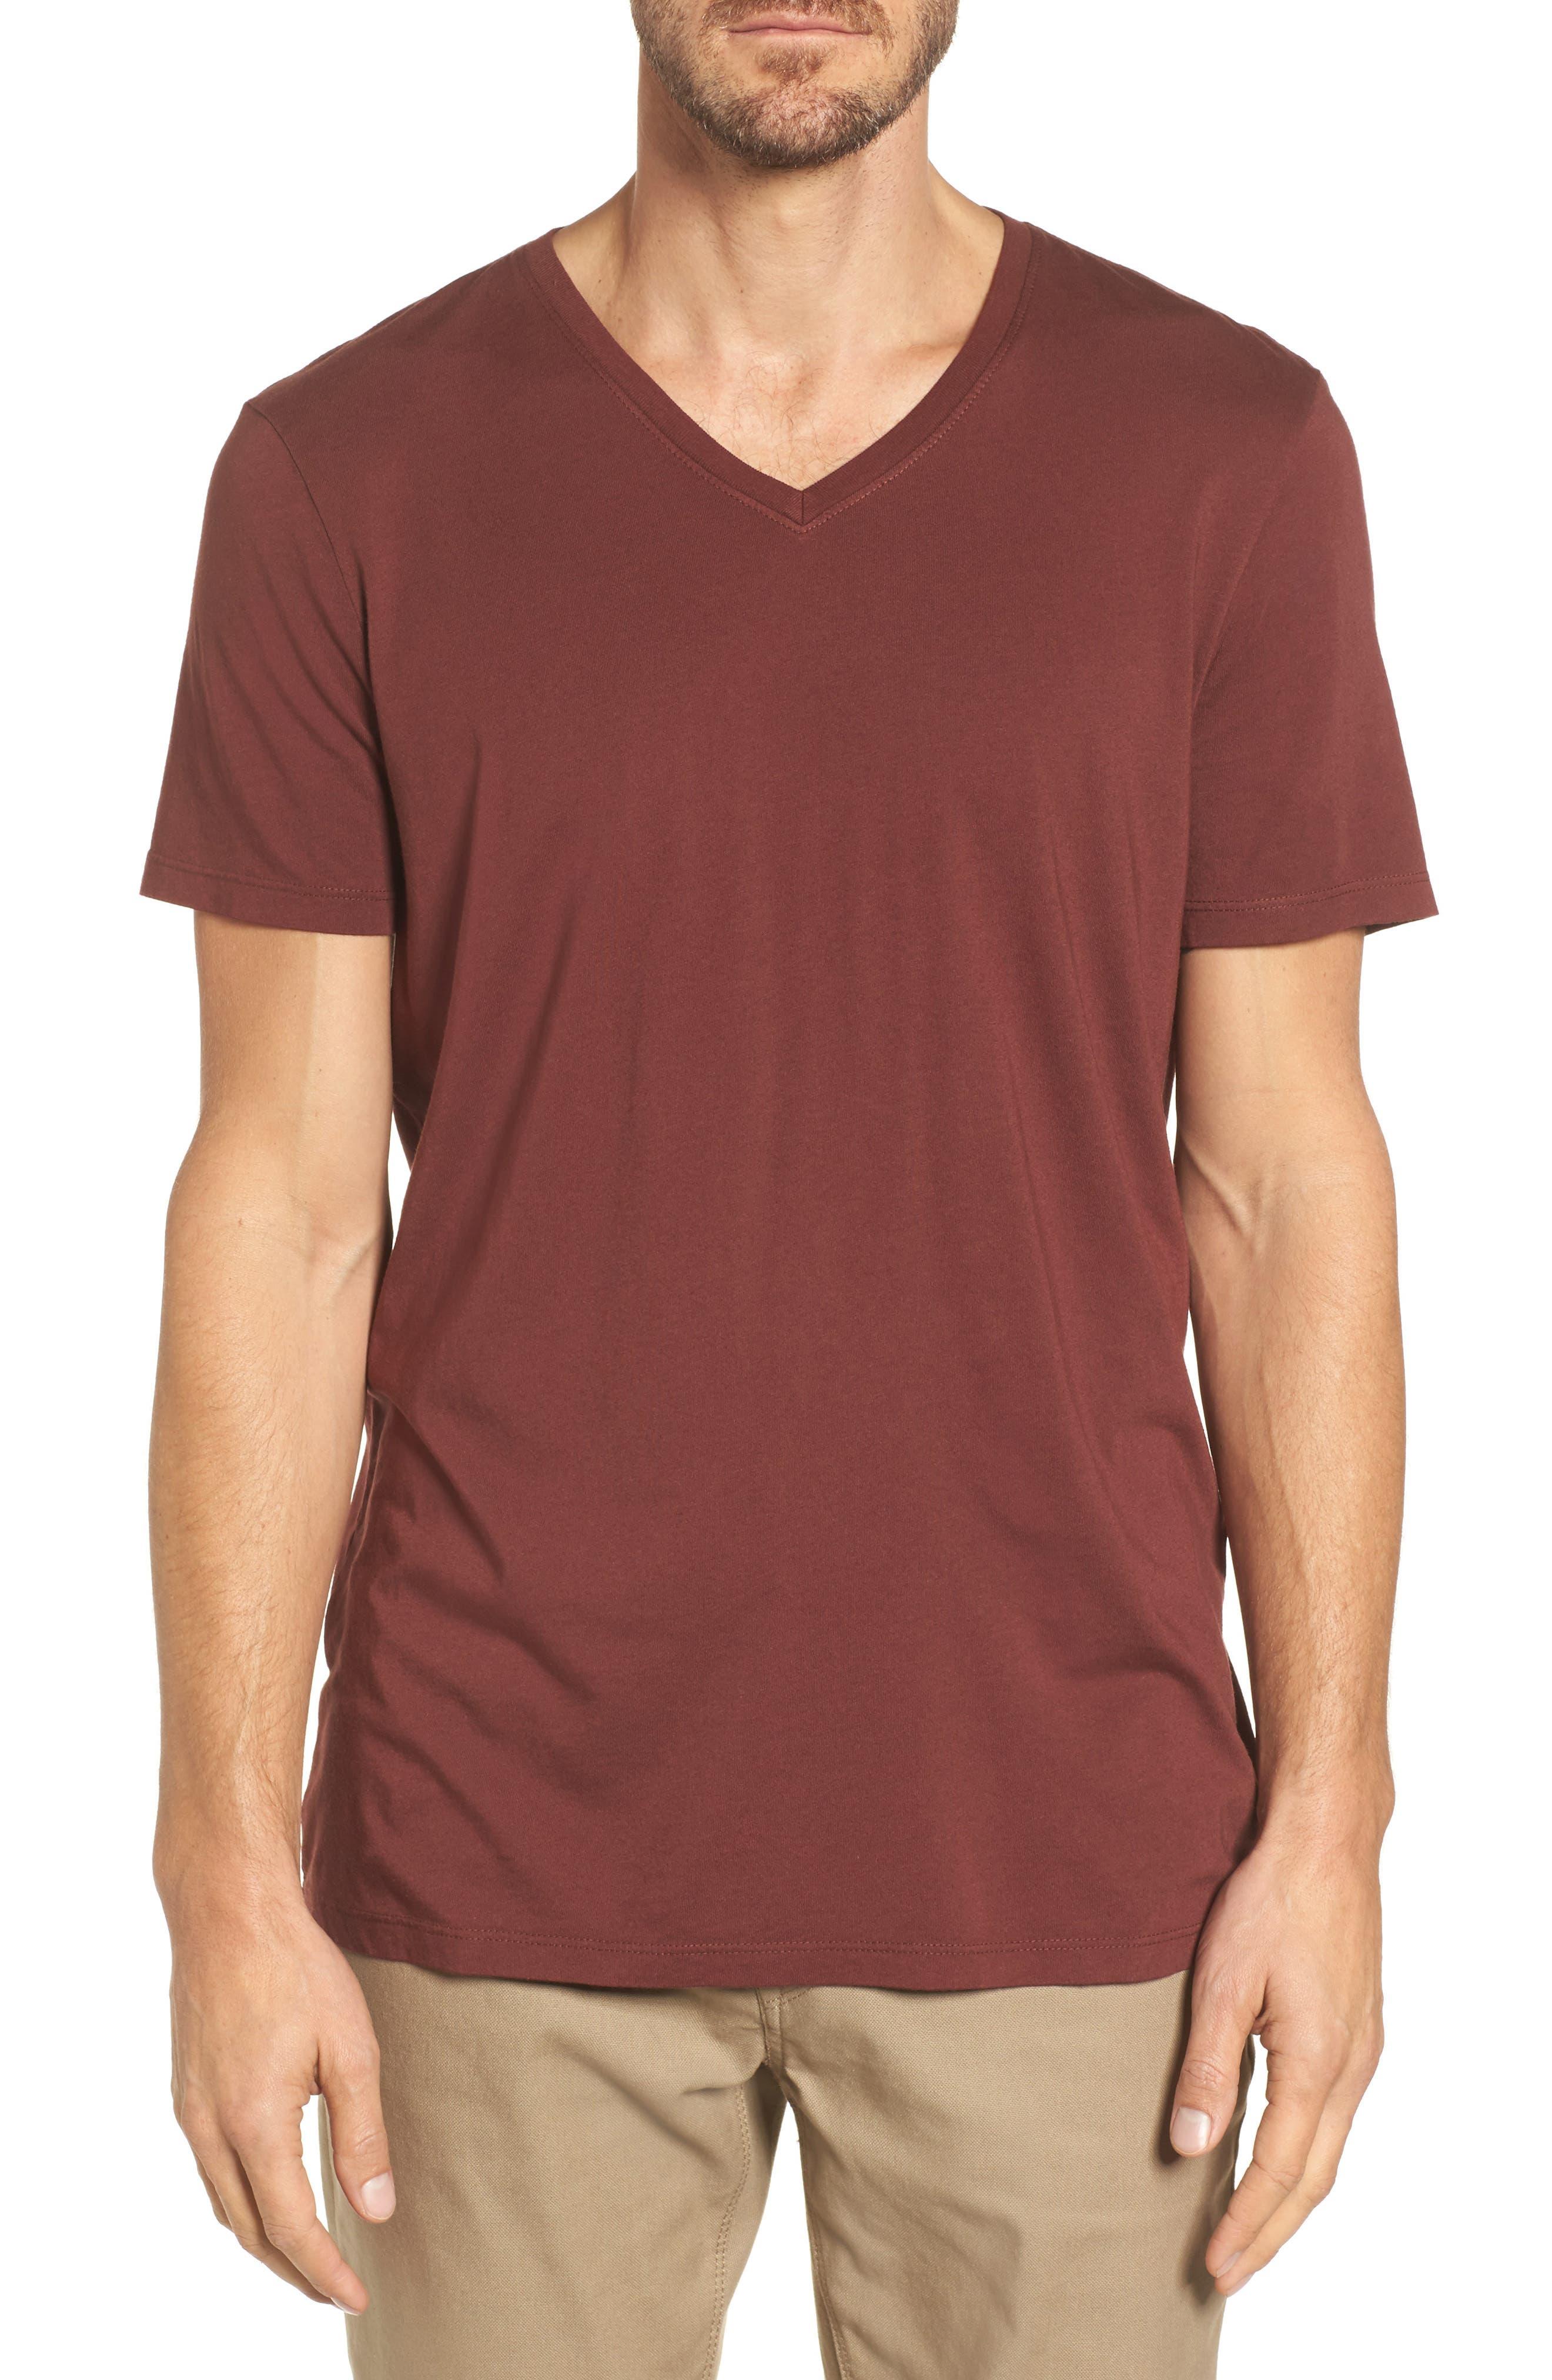 Alternate Image 1 Selected - AG Bryce V-Neck T-Shirt